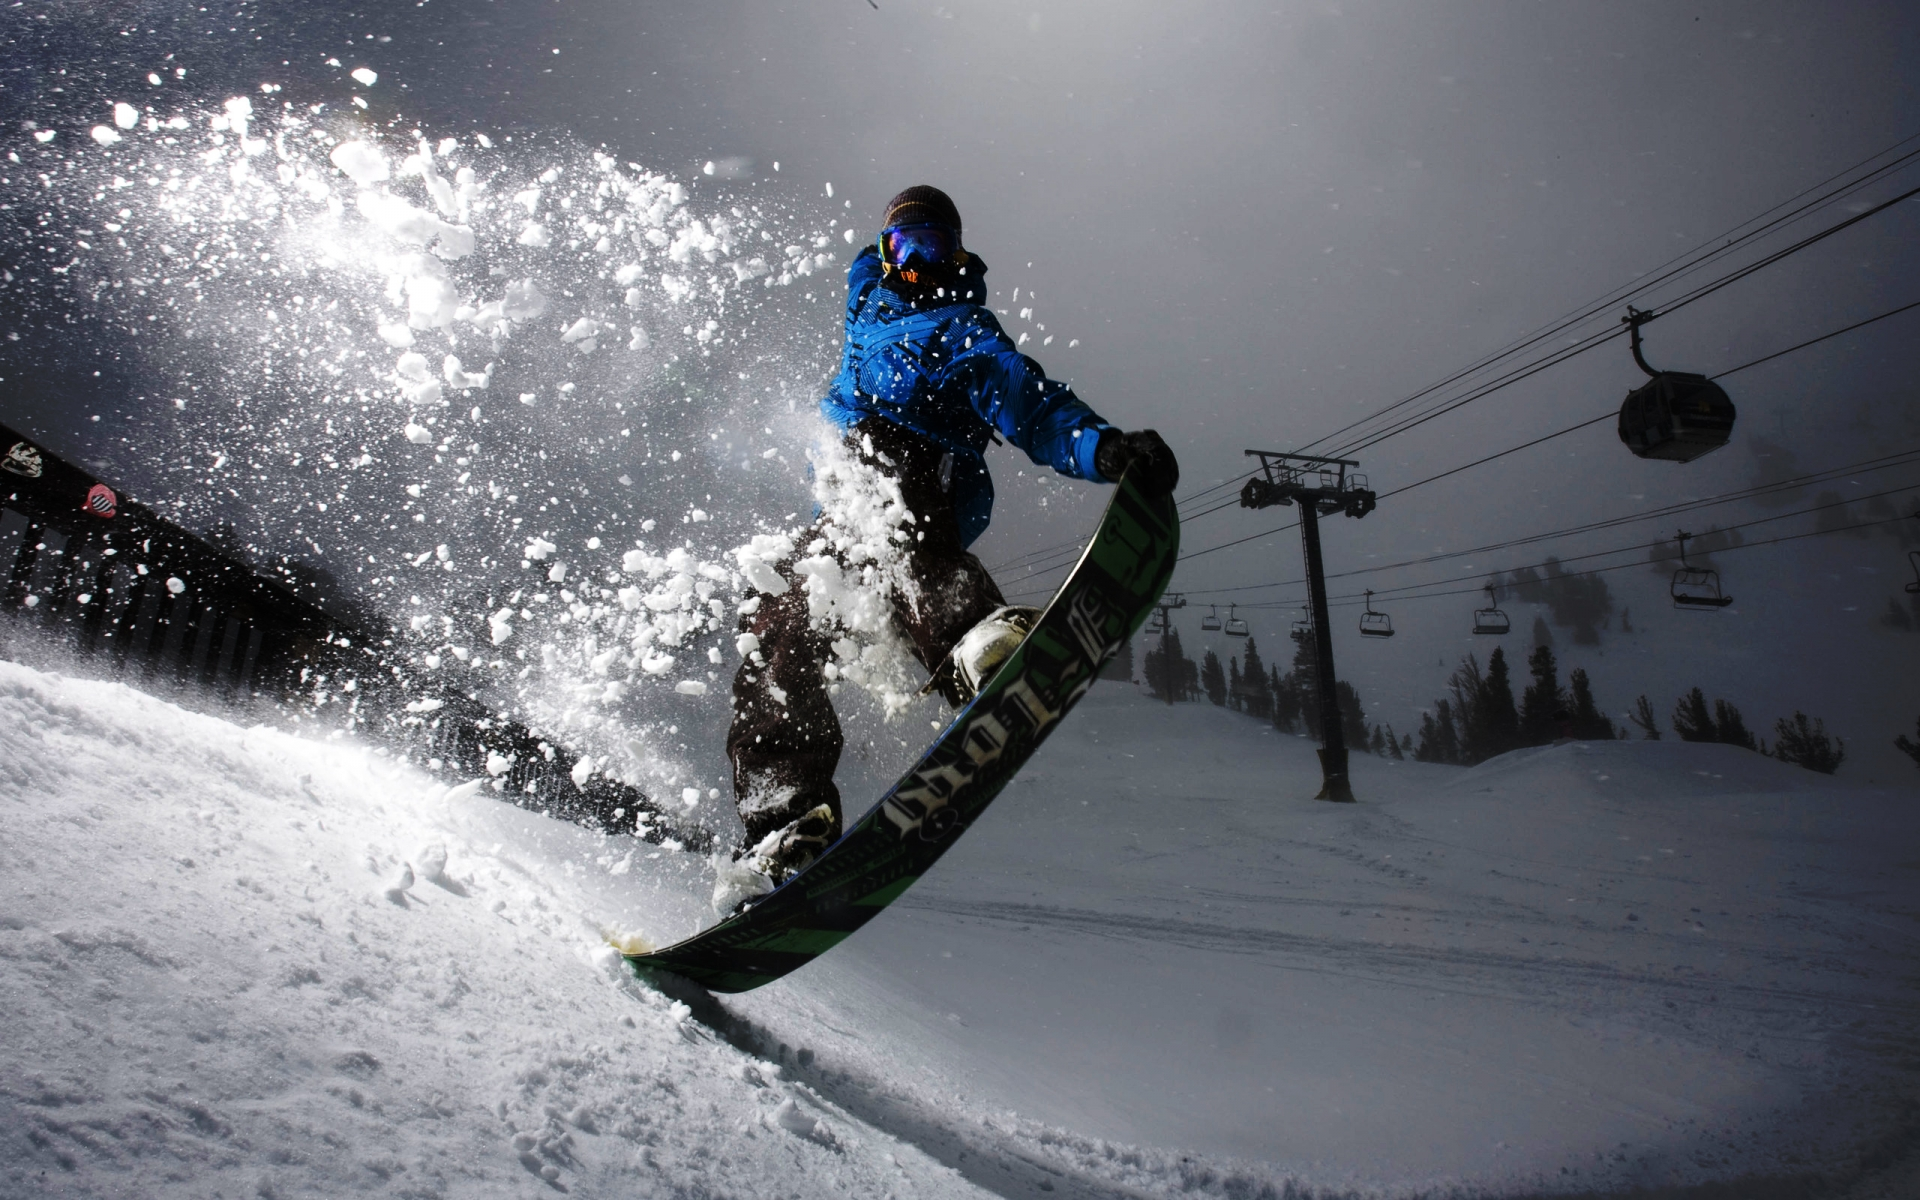 wonderful jumping snowboarding